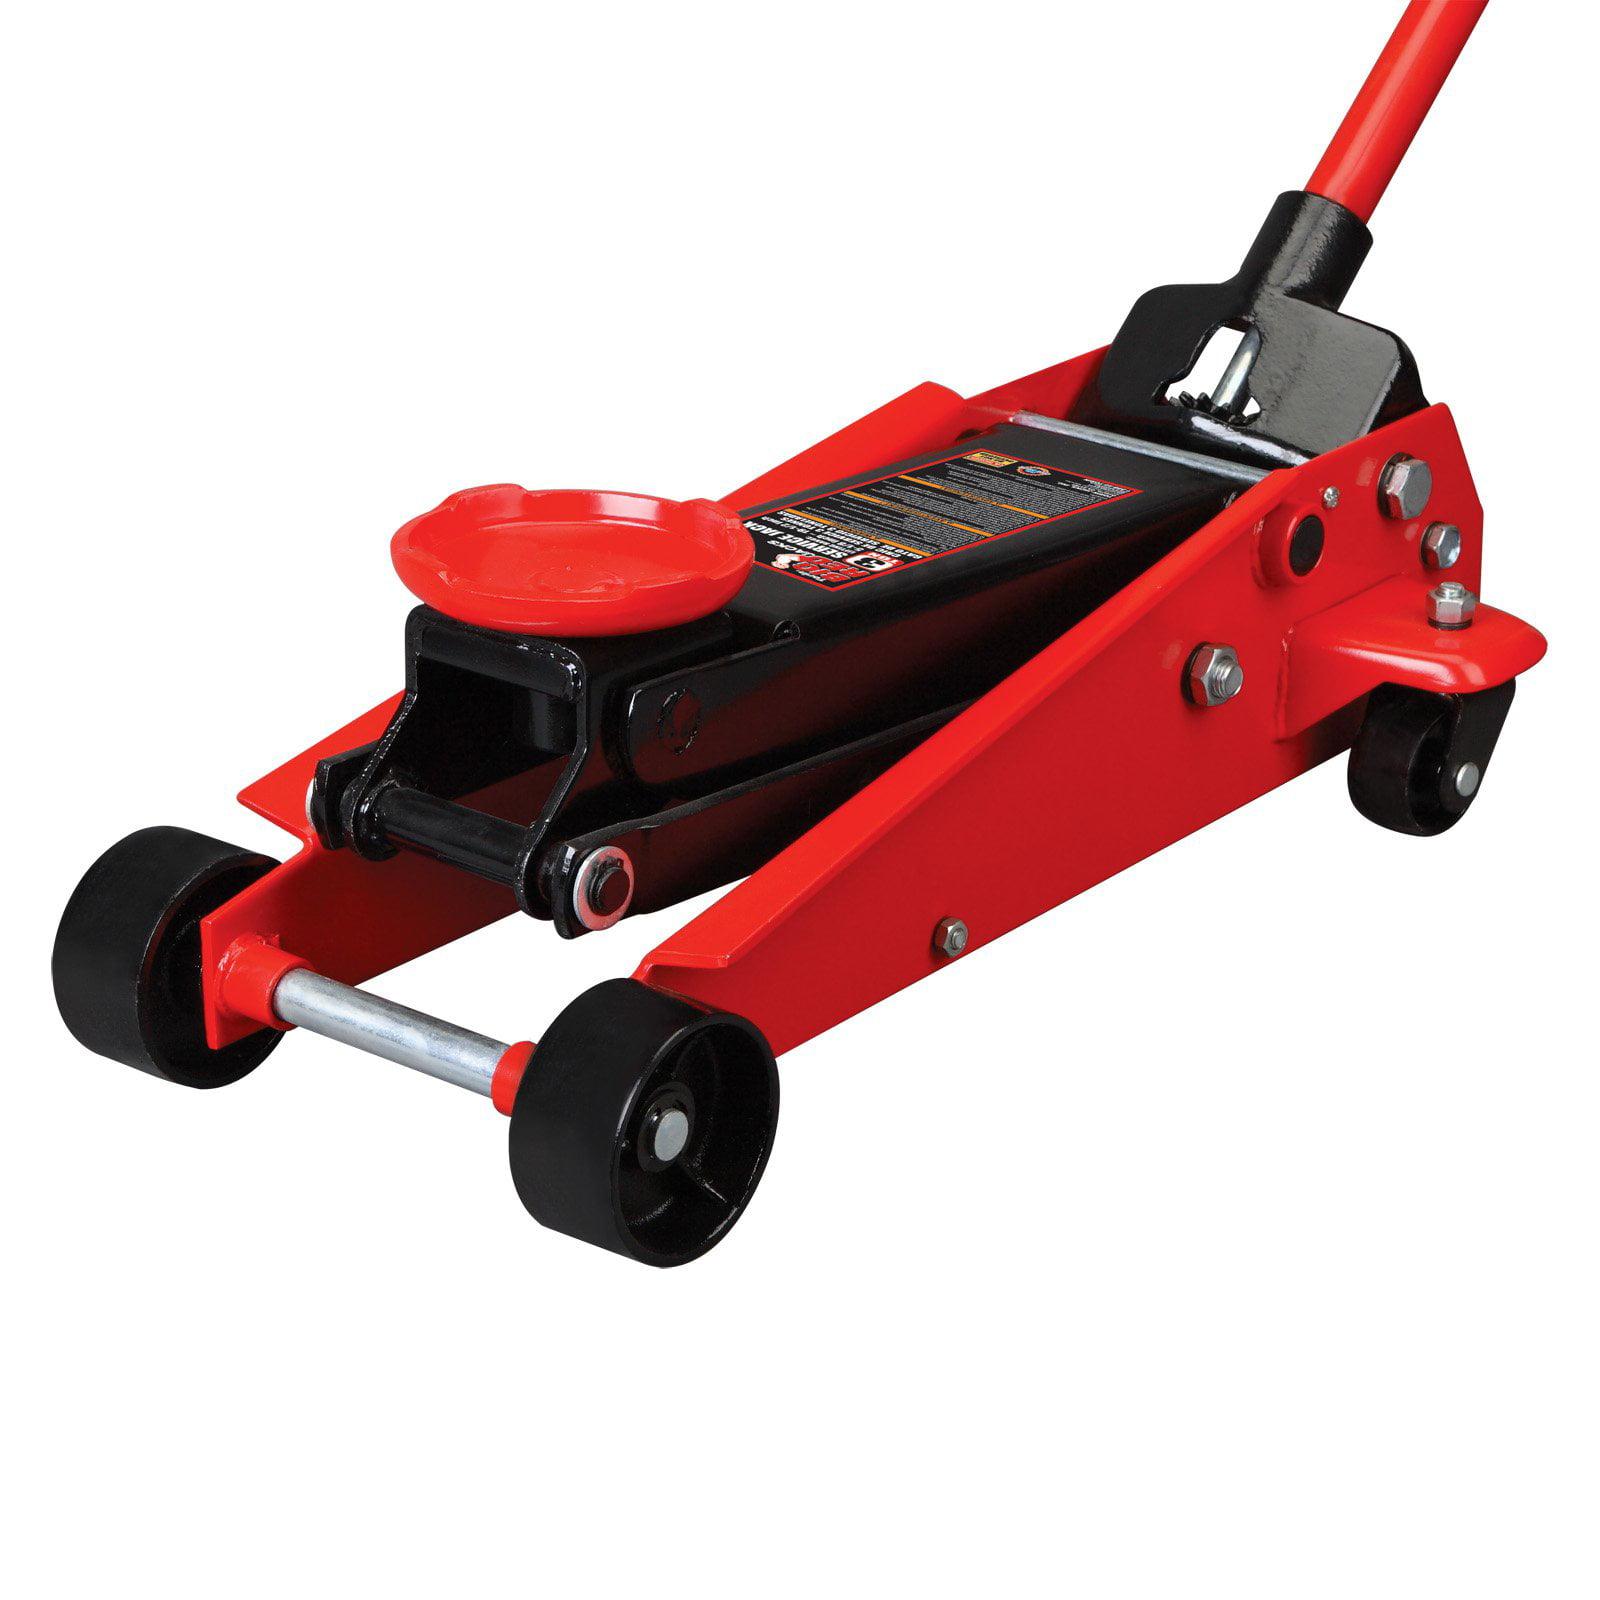 Torin Big Red T83002 3 Ton Pro Series 6000 Garage Jack   Walmart.com